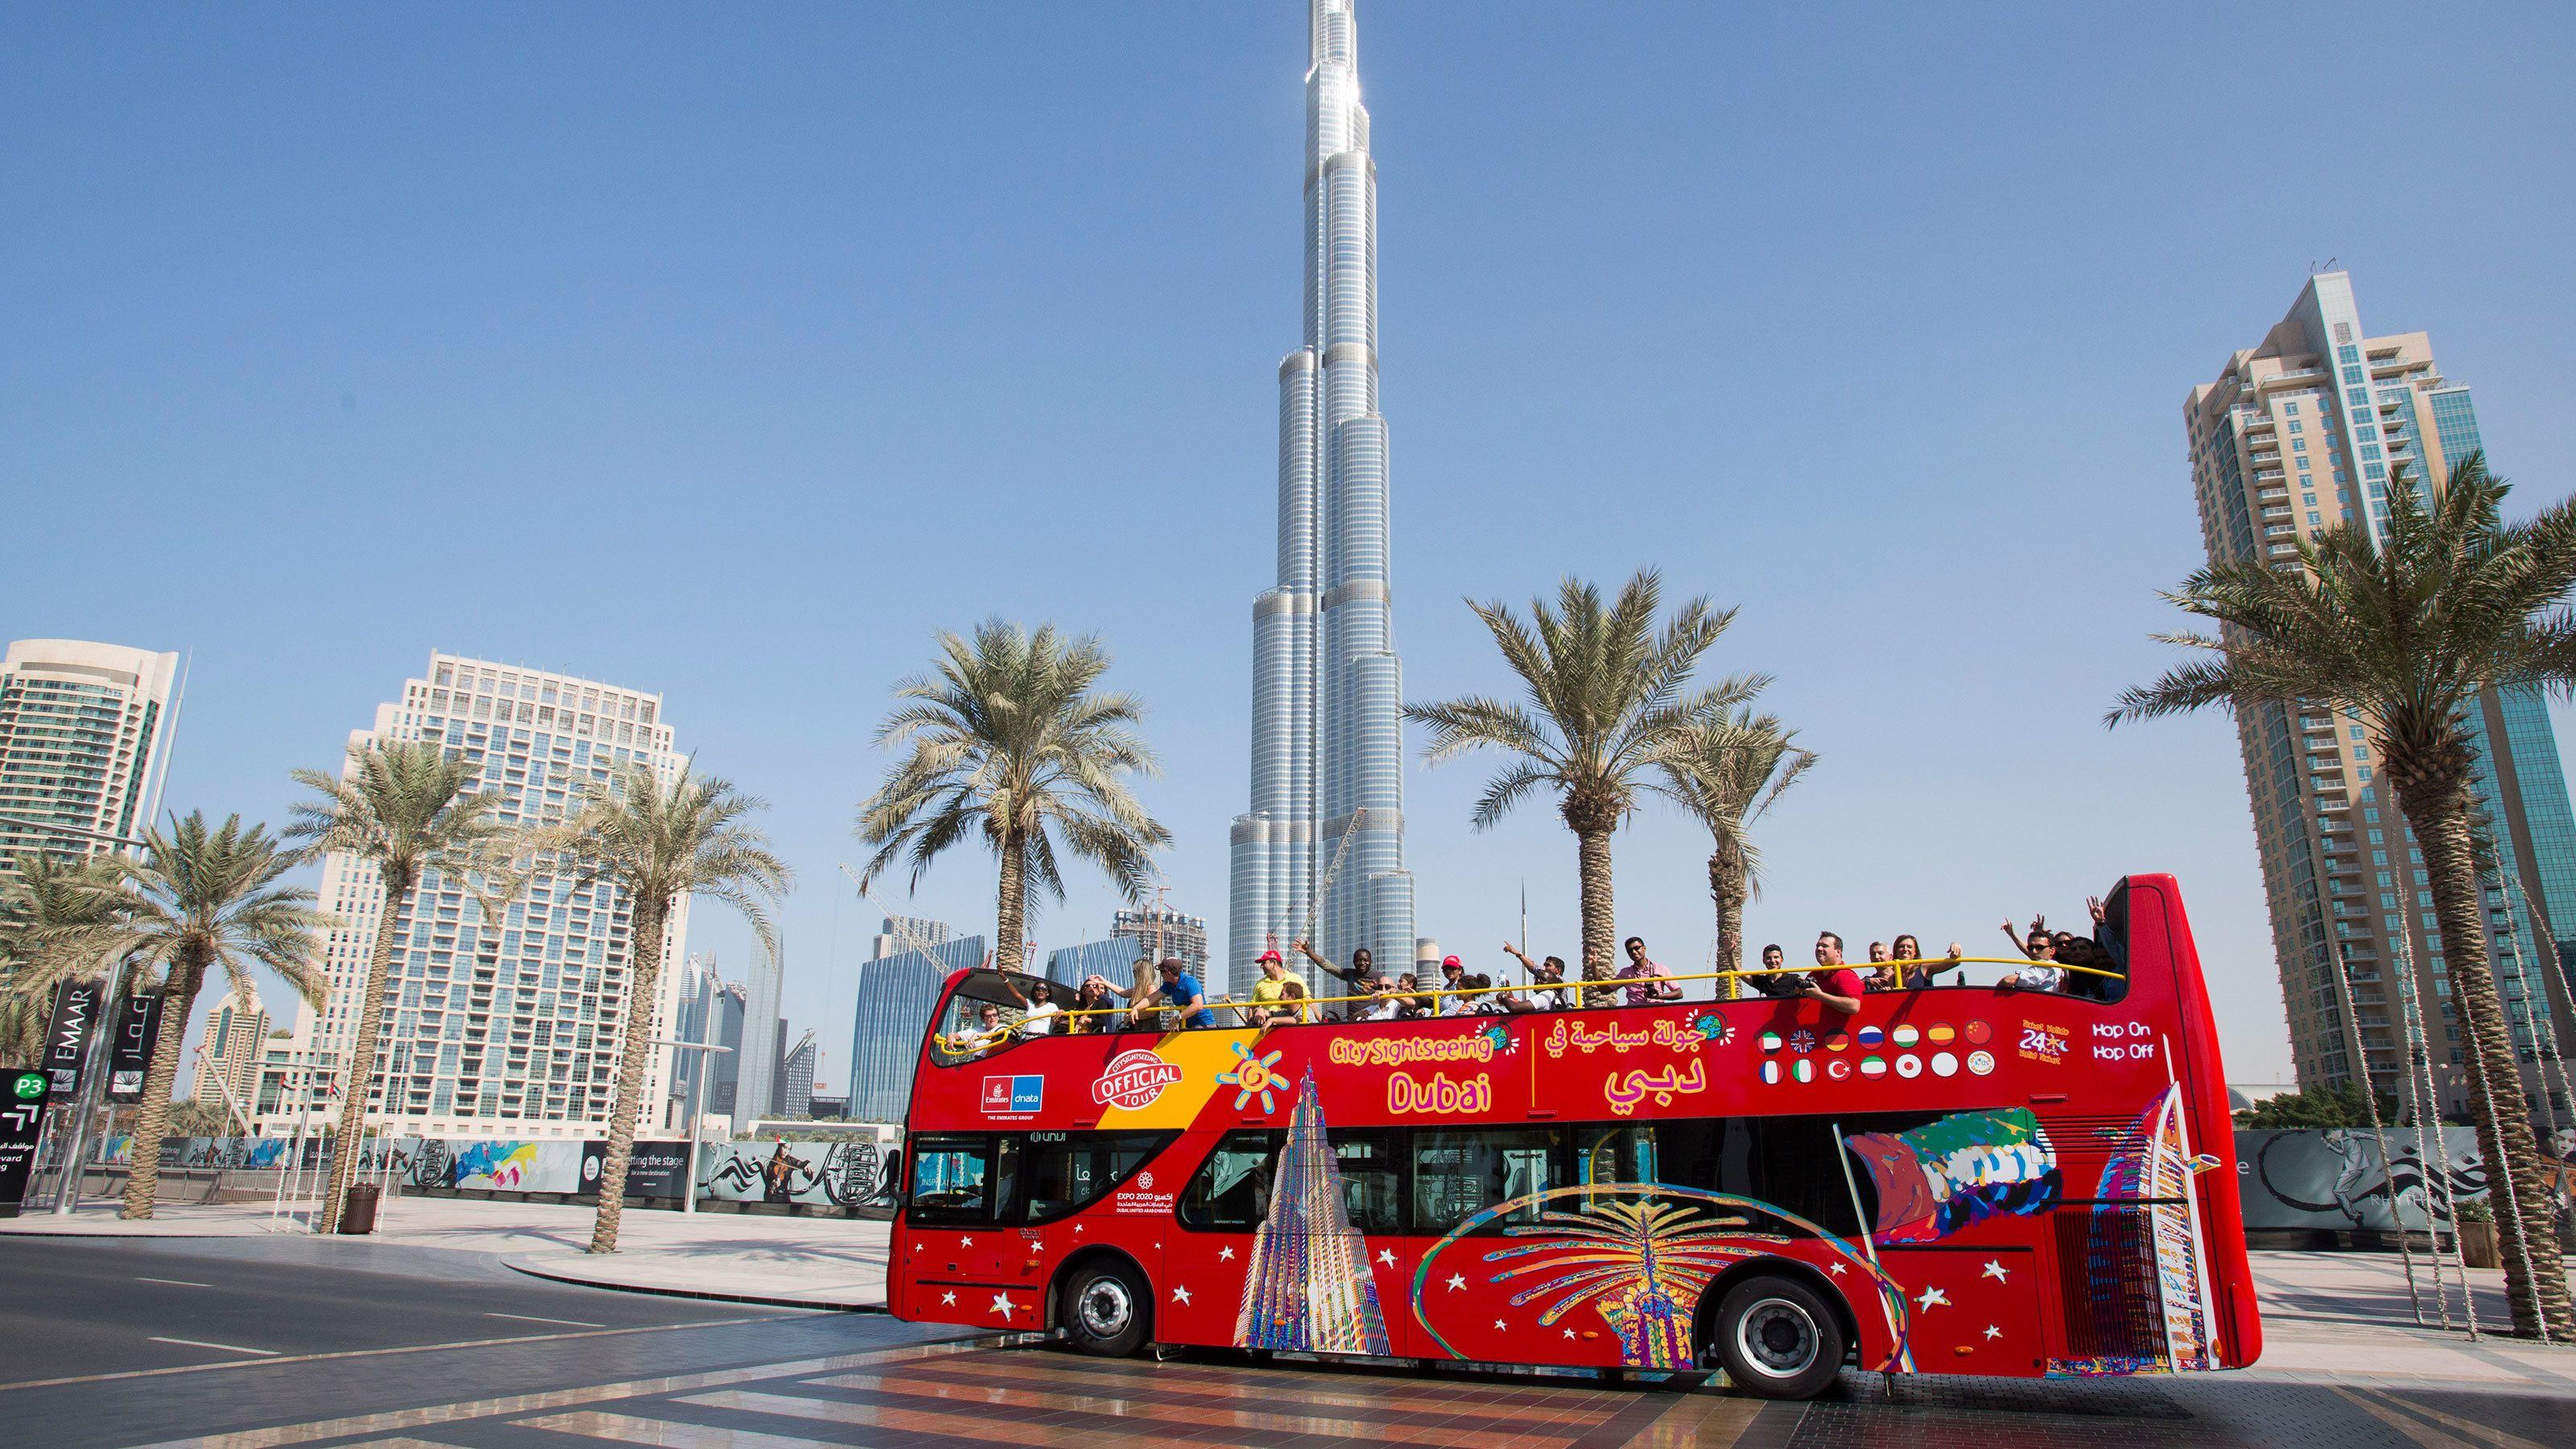 City Sightseeing Dubai Hop-On Hop-Off Bus Tour